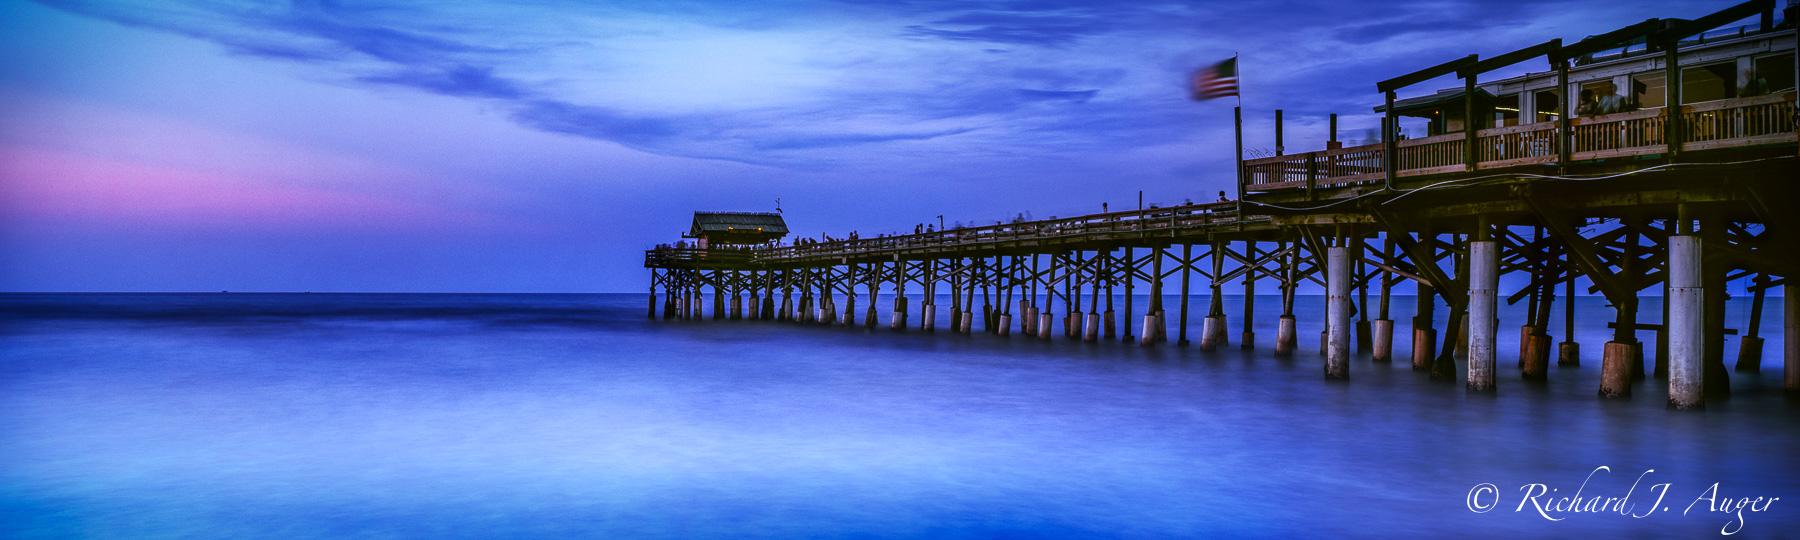 Cocoa Beach Pier, Florida, Panorama, Sunset, Blues, Calm